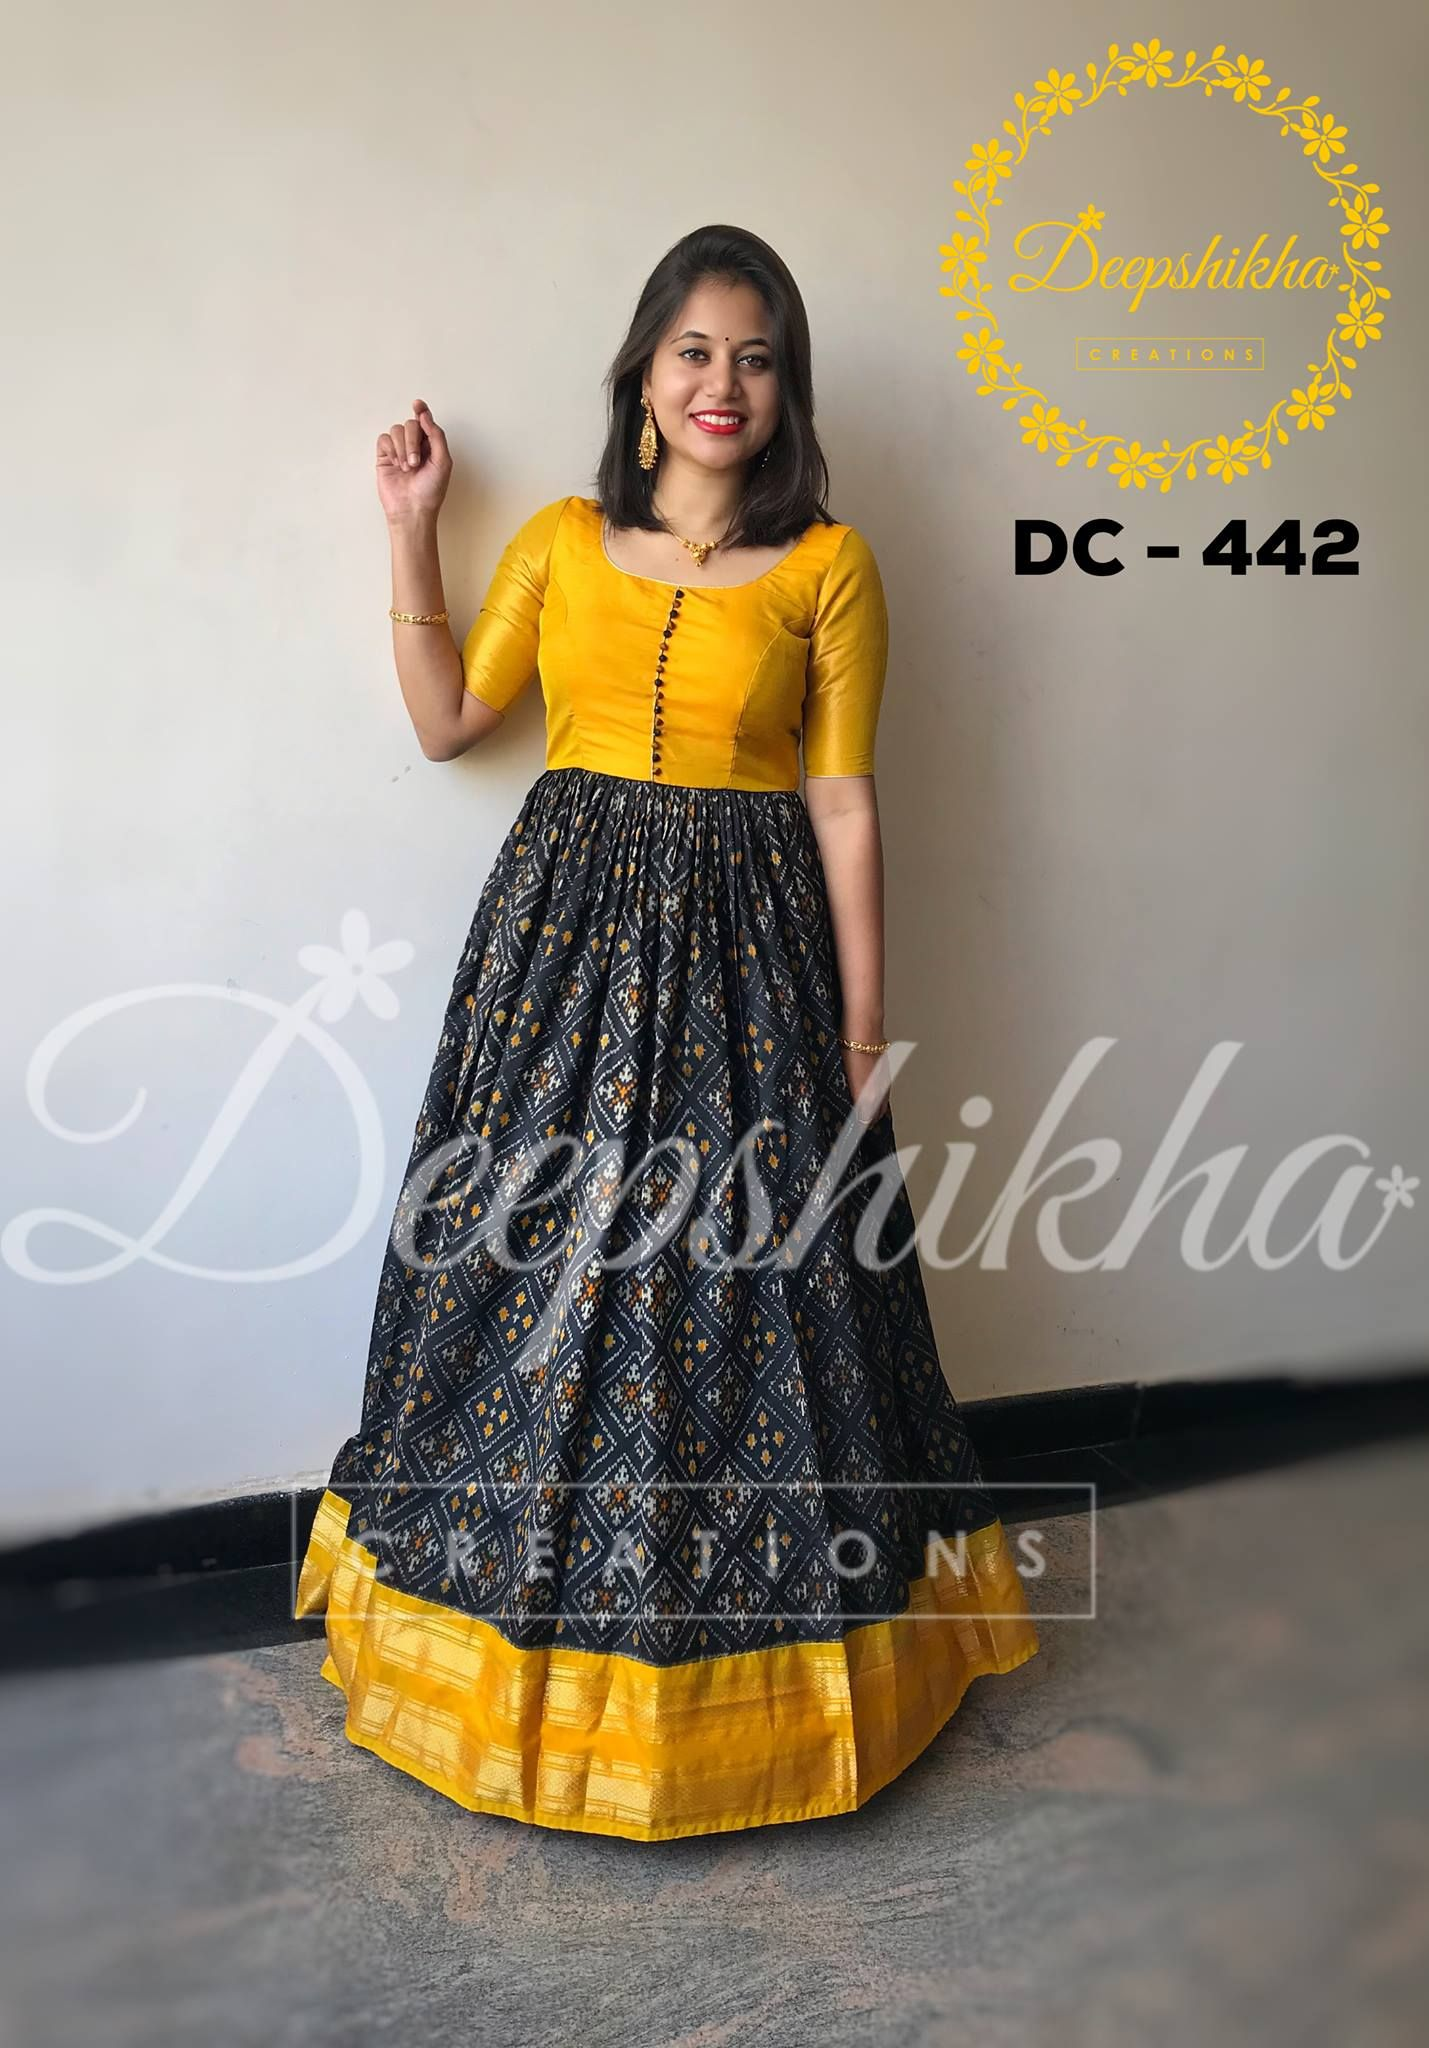 b3a31d4963563e For queries kindly WhatsApp   9059683293. Deepshikha Creations. Contact    090596 83293. Email   deepshikhacreations gmail.com.